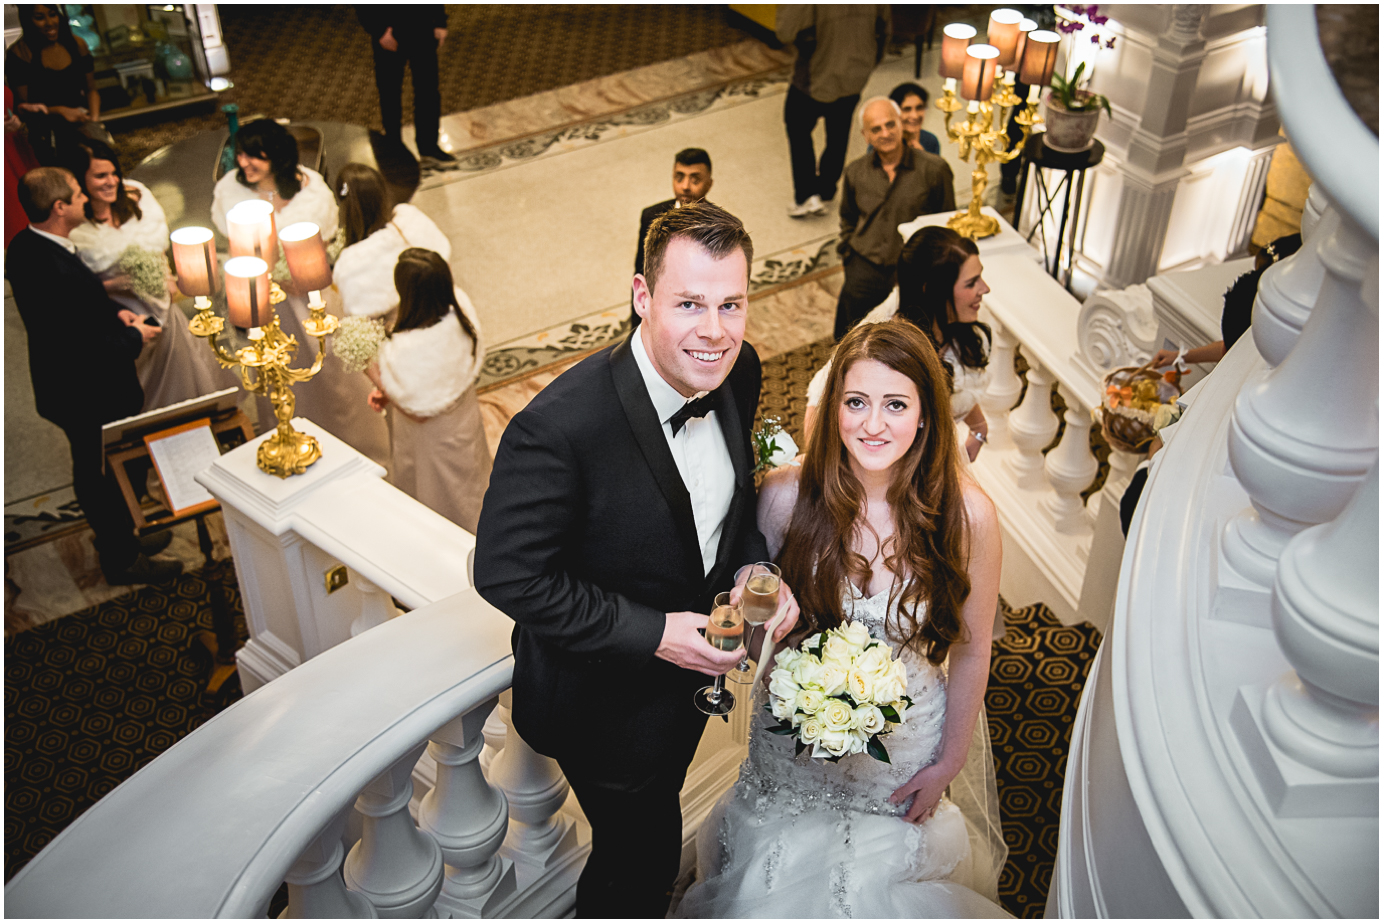 42 - Esmat and Angus - St. Ermin's Hotel London wedding photographer